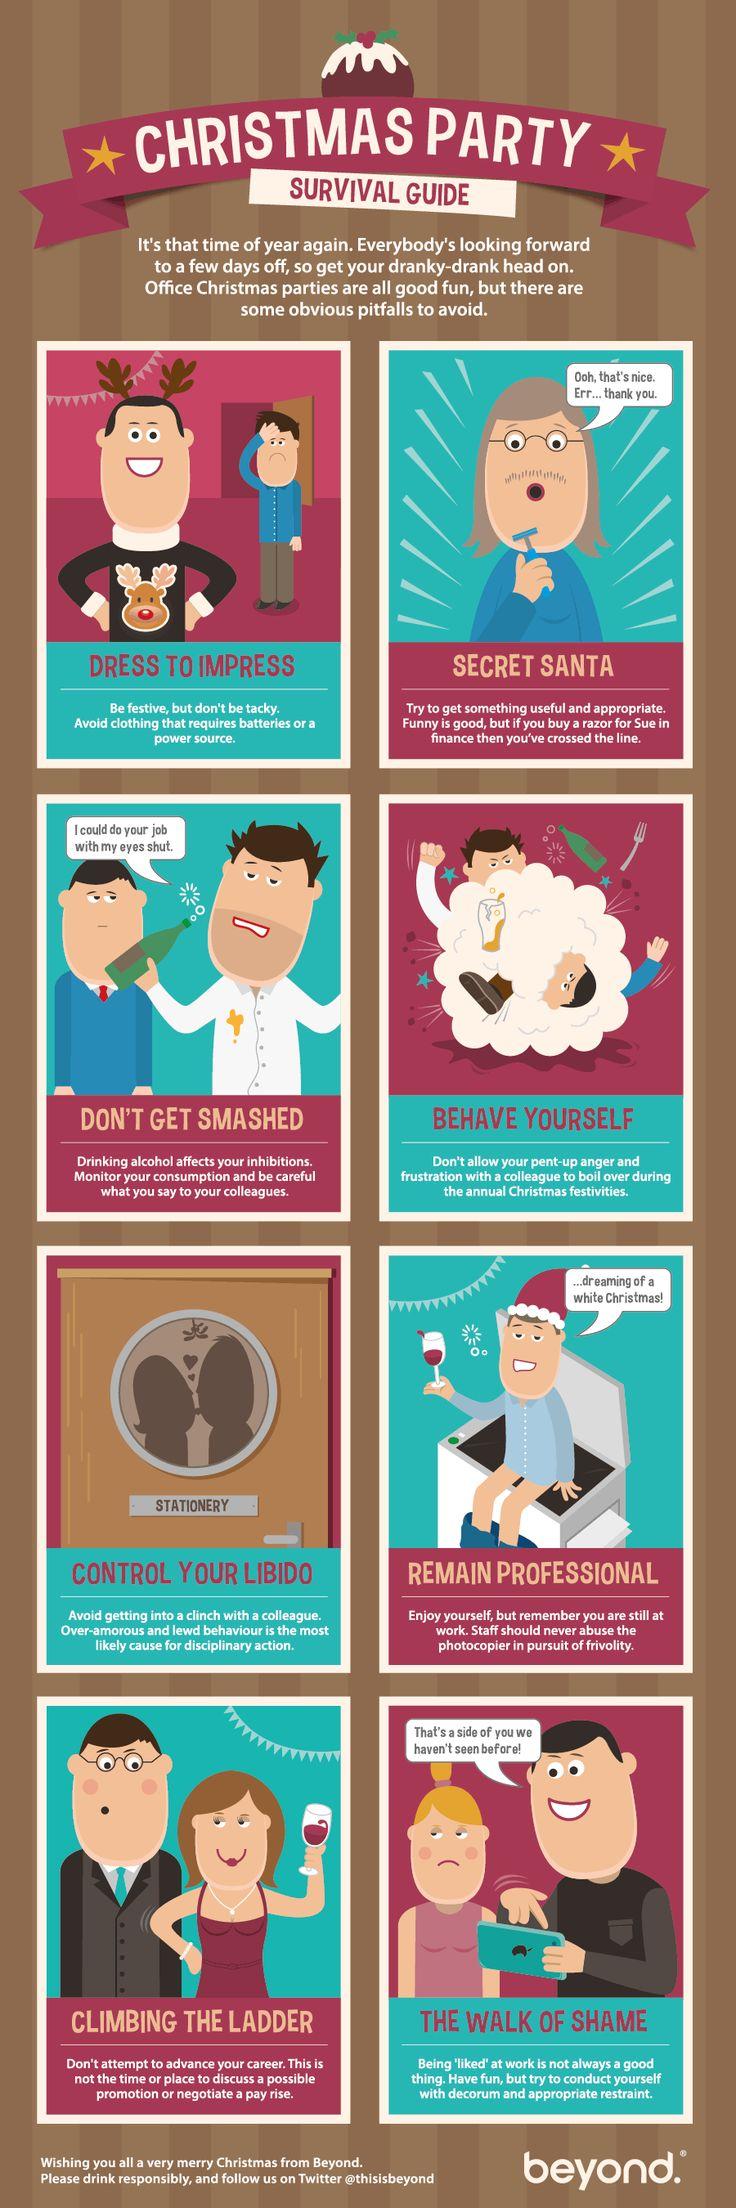 11 best Leadership images on Pinterest | Personal development ...